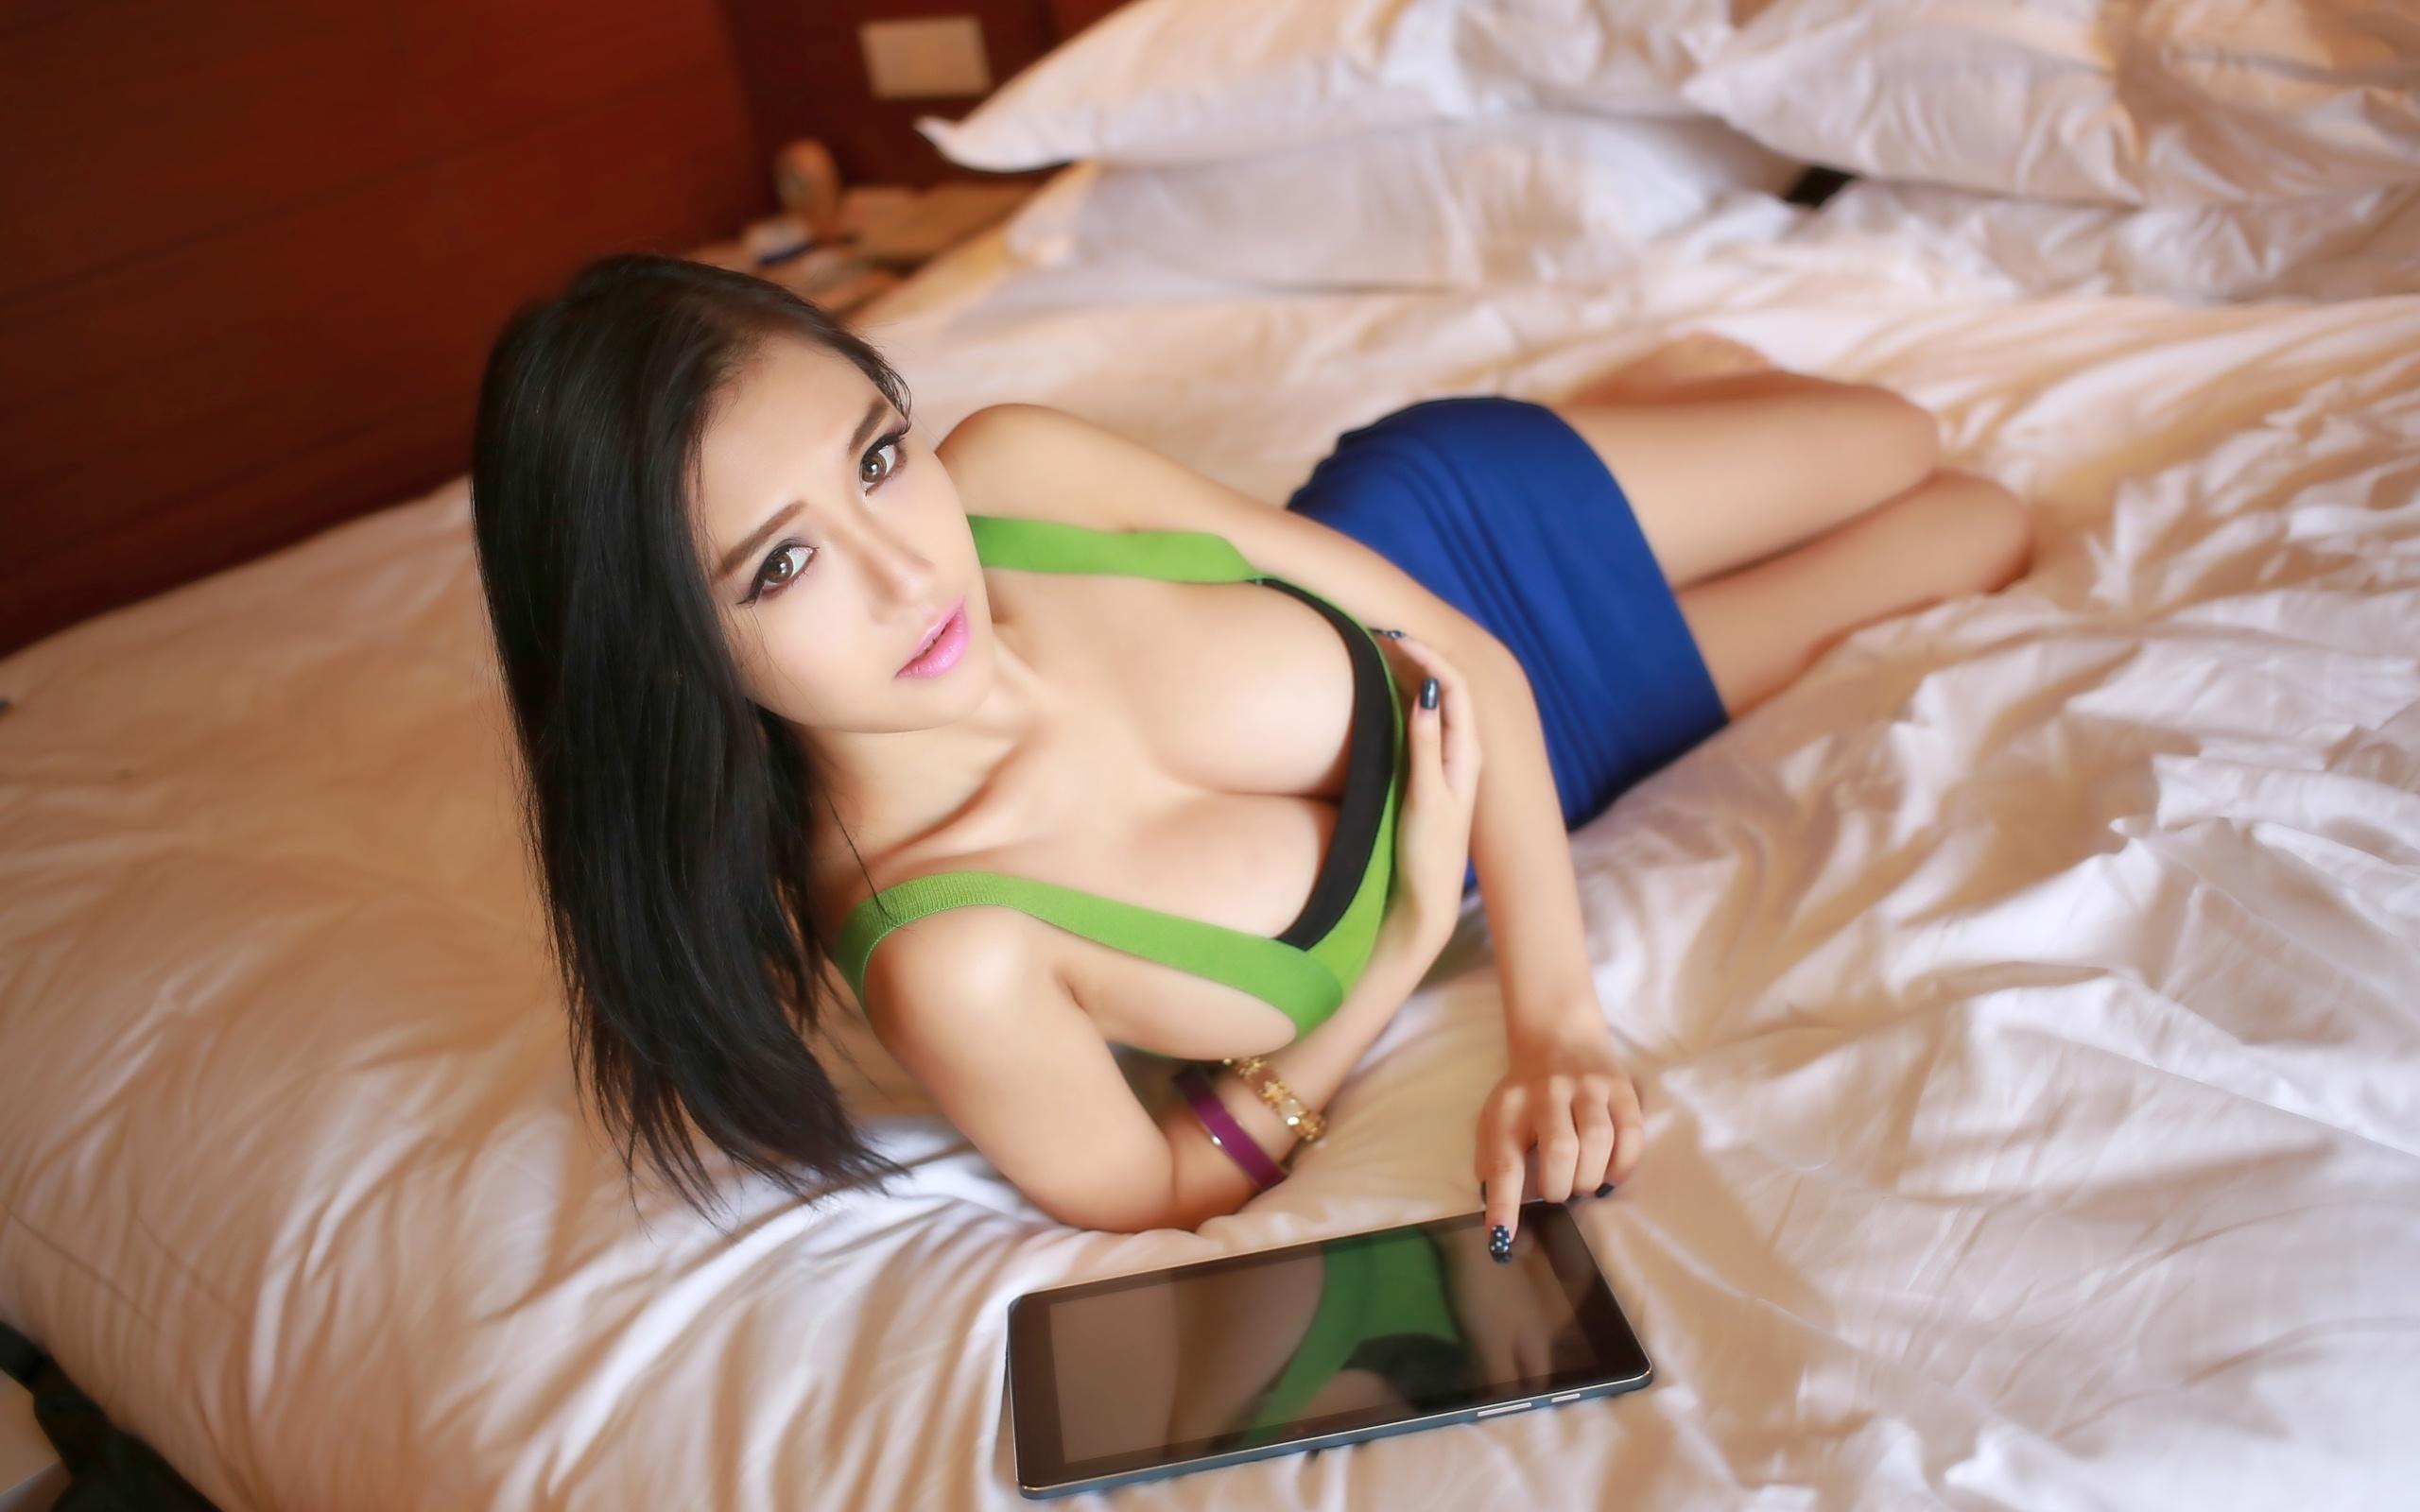 Скиртинг онлайн азиатки 21 фотография